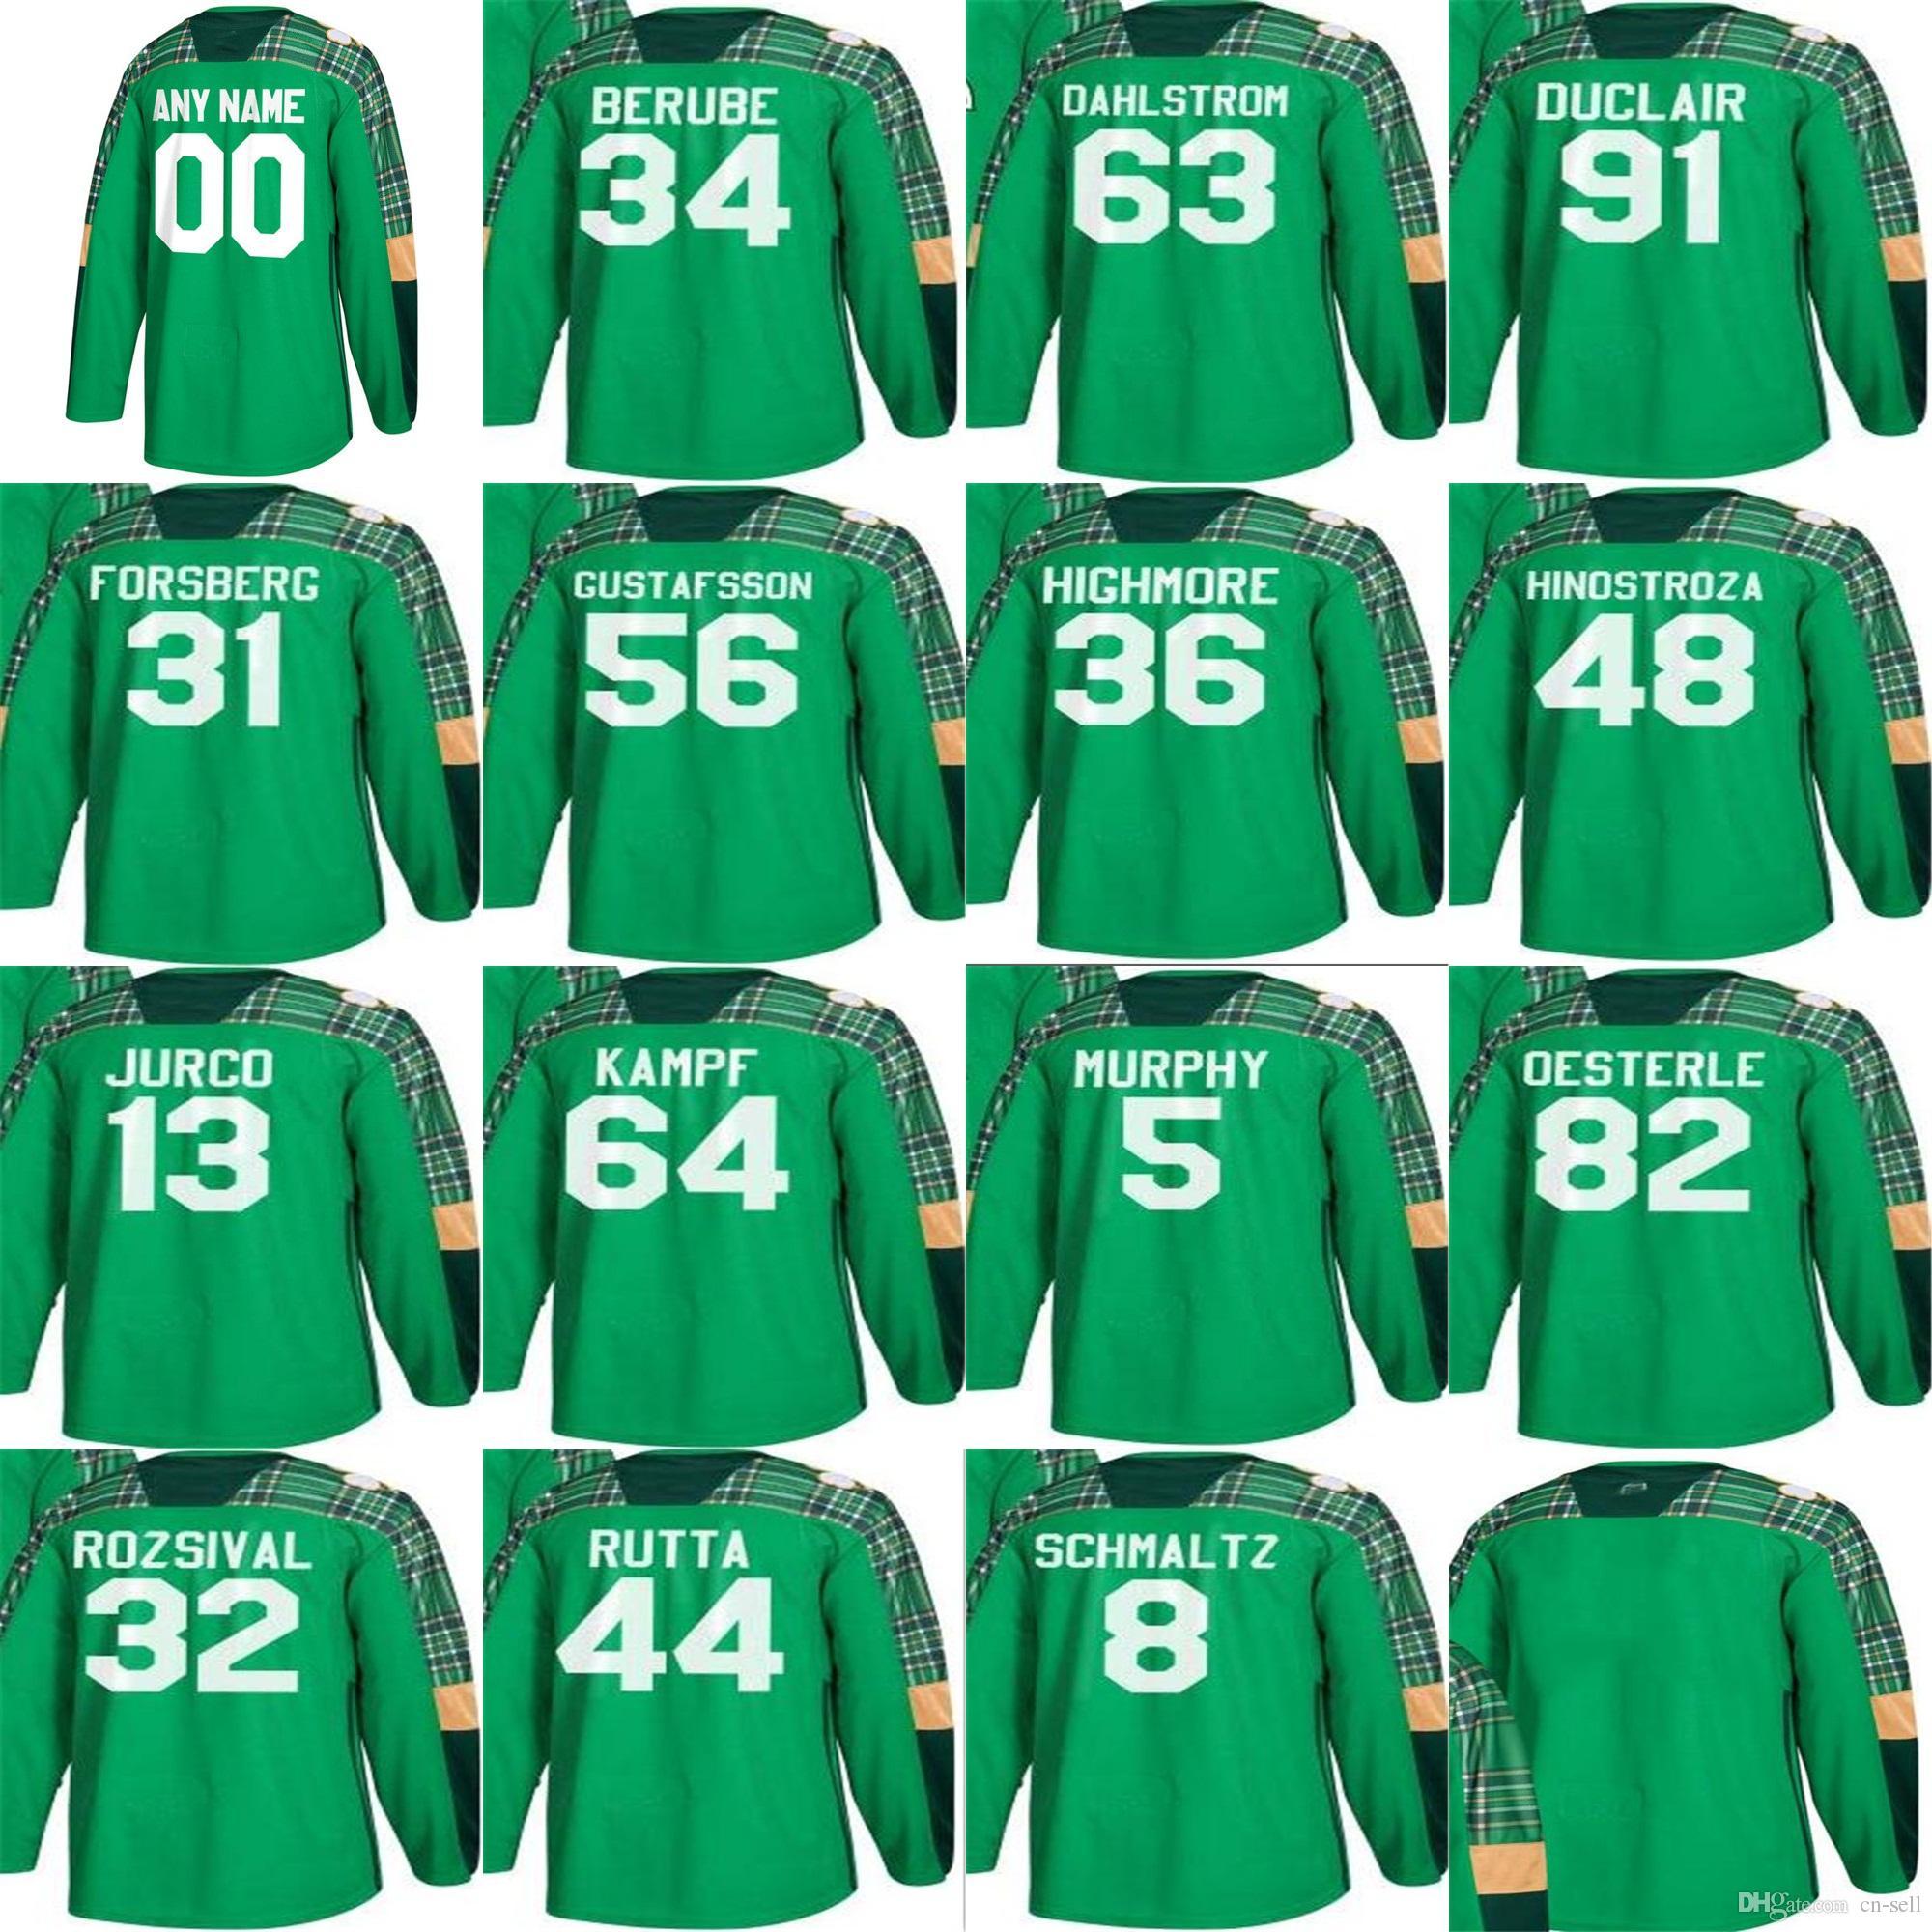 new style c7f01 e9218 Mens 2018 Chicago Blackhawks 63 Carl Dahlstrom 34 Jean-Francois Berube 31  Anton Forsberg Jurco Green St. Patricks Day Custom Hockey Jerseys